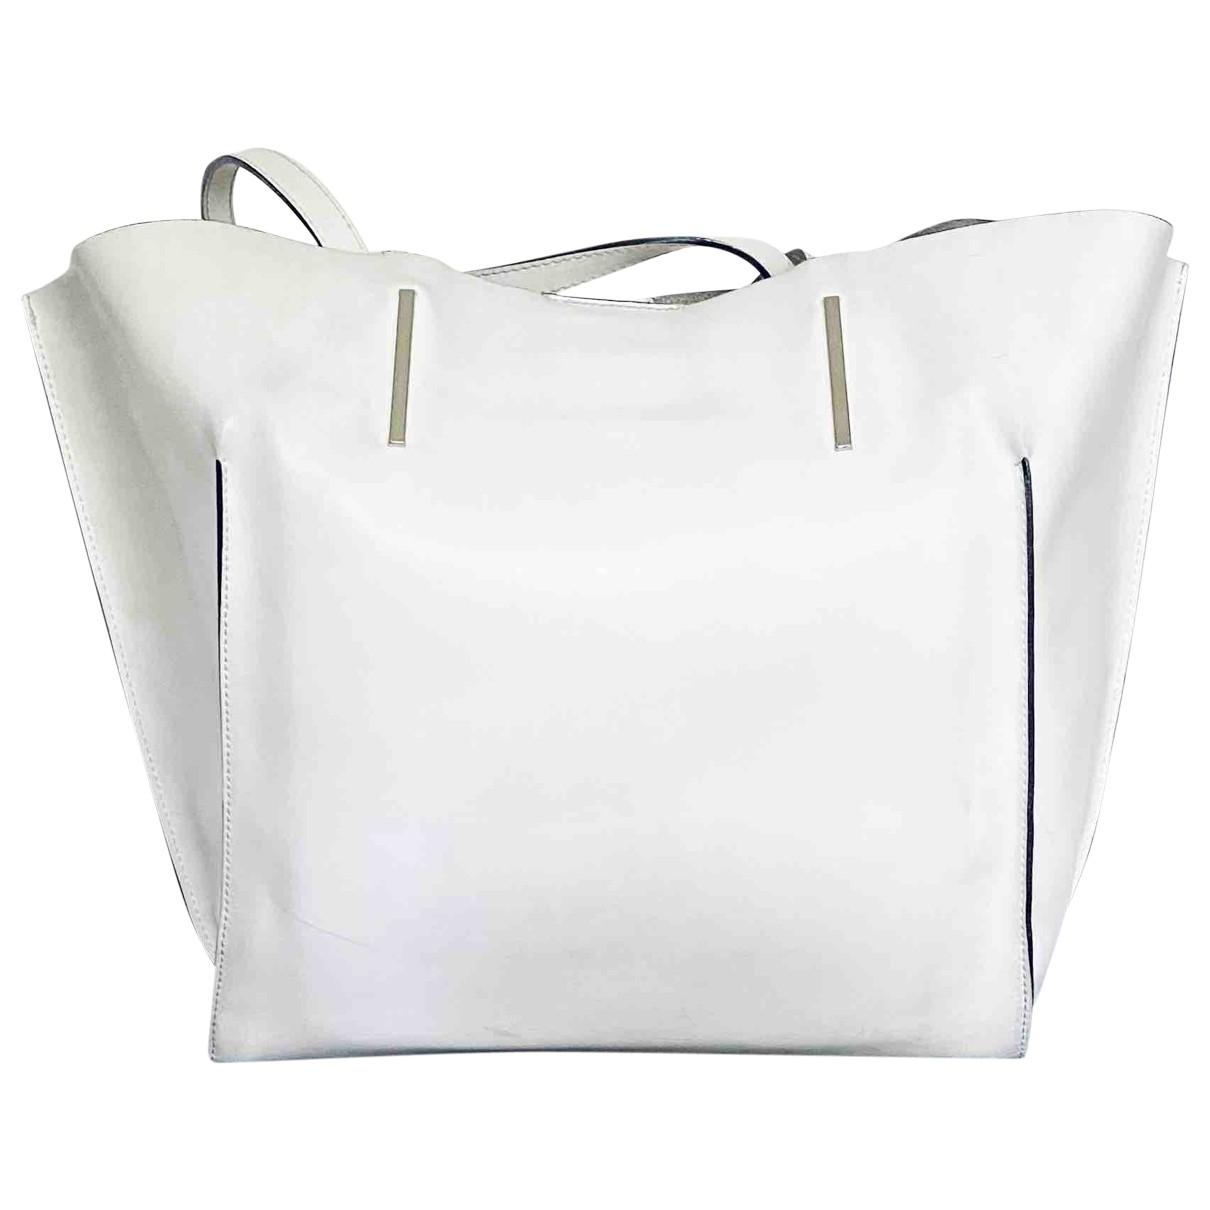 Gianni Chiarini N White Leather handbag for Women N